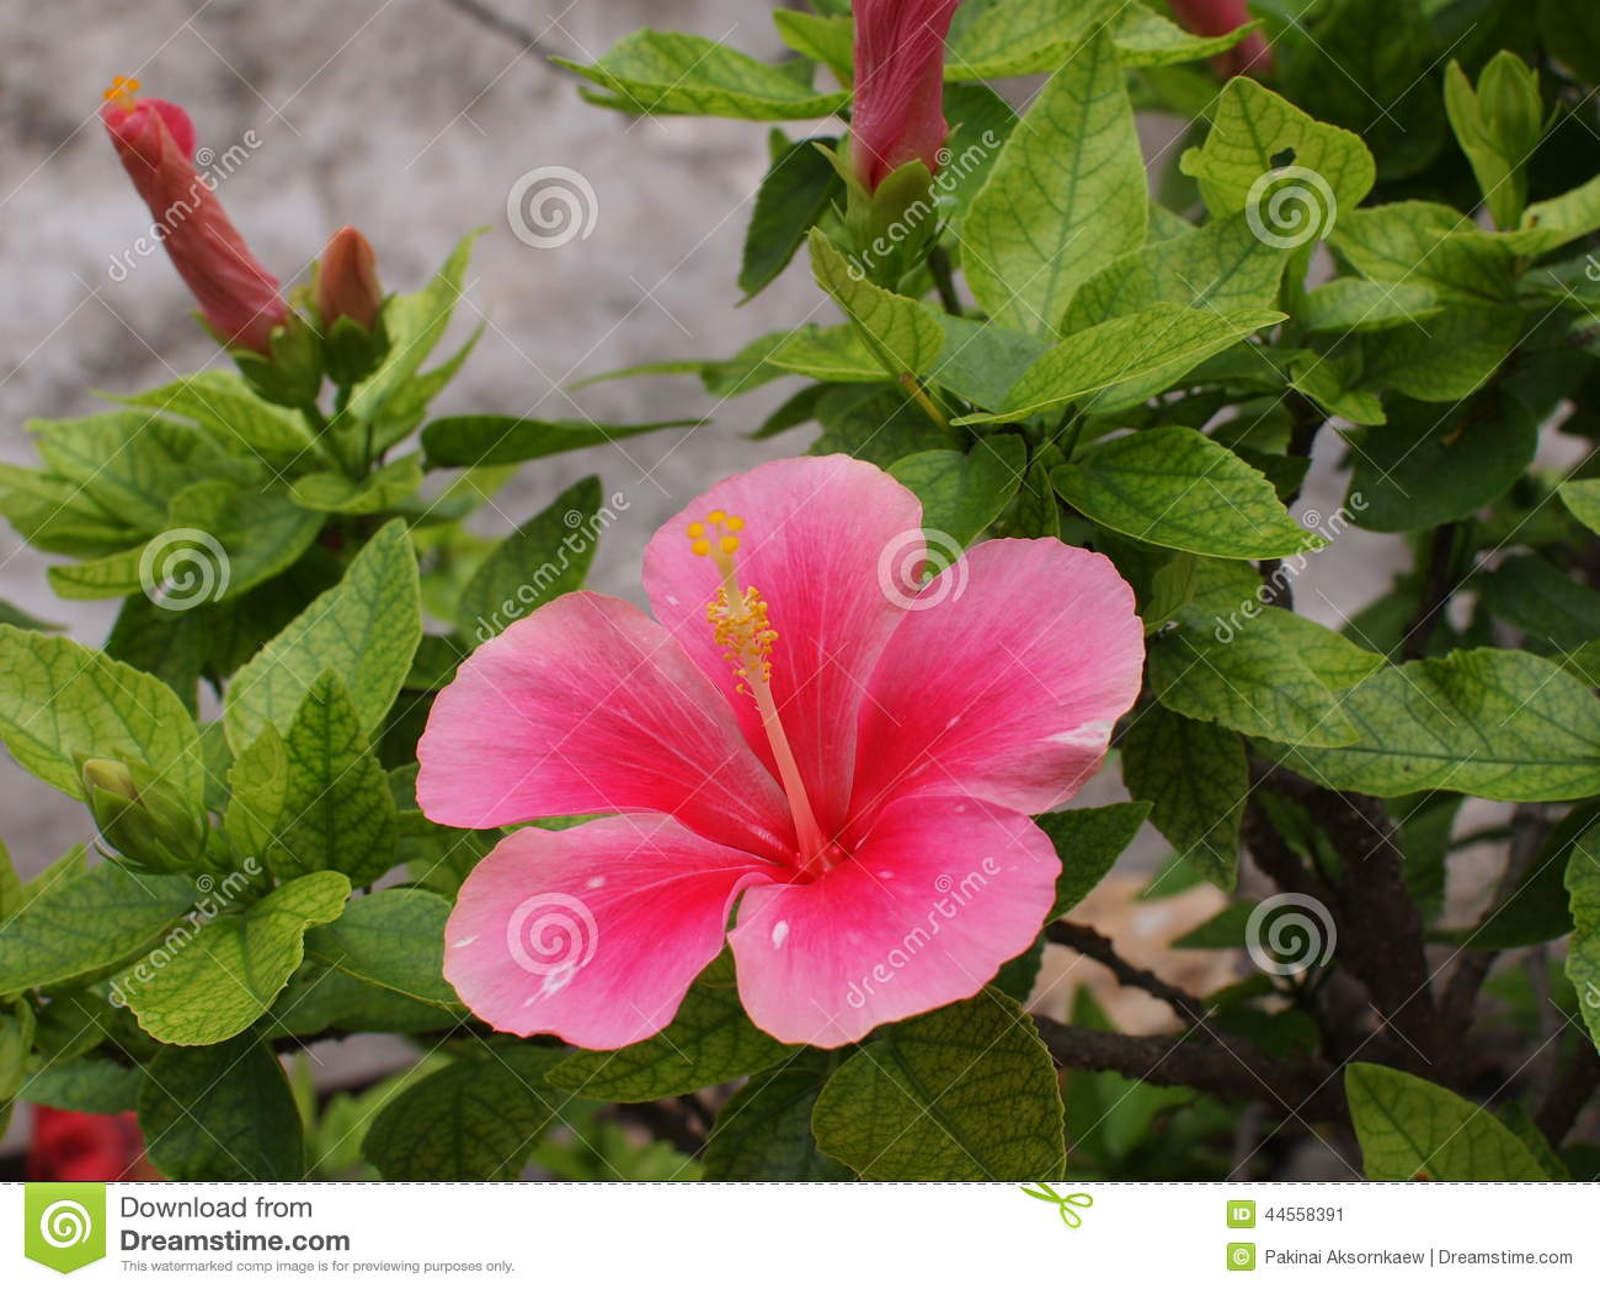 Lady Pink Flower Stock Image Image Of Pinklady Buetyflower 44558391